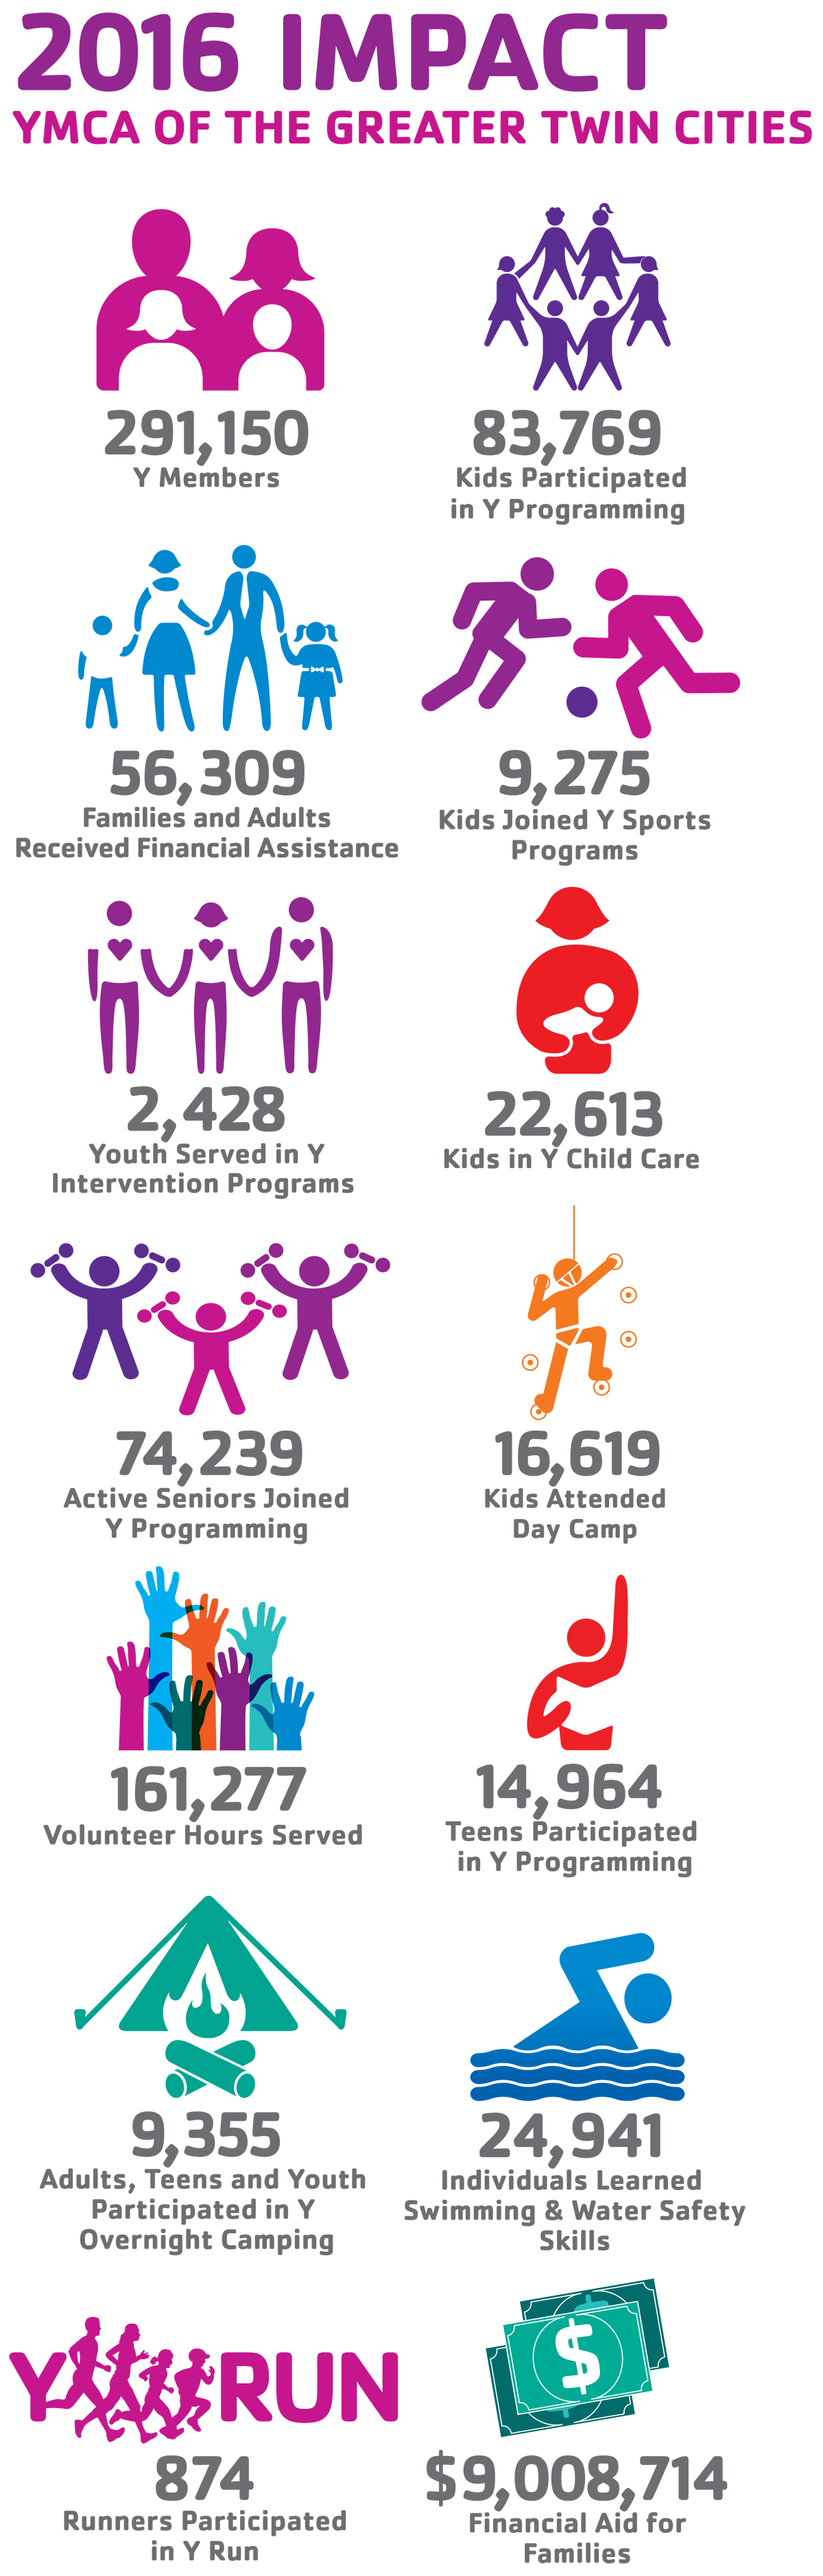 Image Result For Ymca Preschool Infographic Ymca Programming For Kids Marketing Design